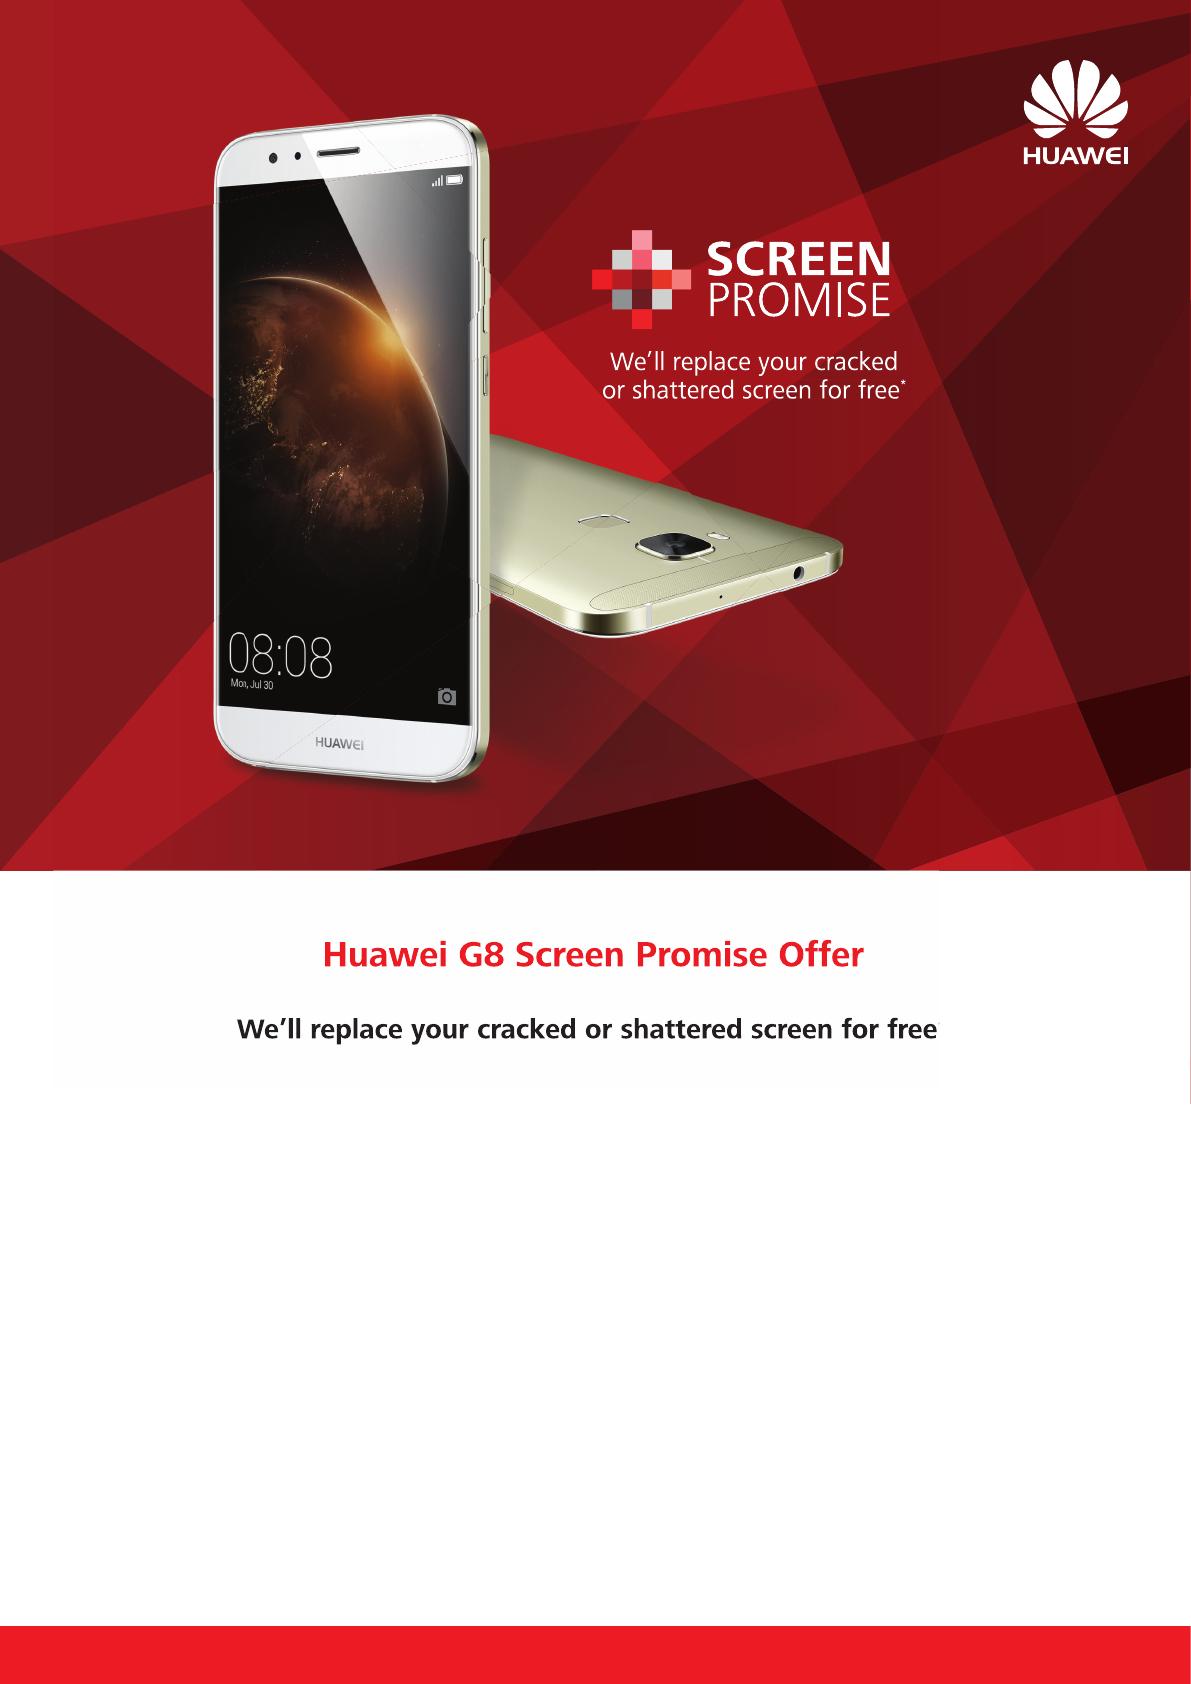 Huawei G8 Sp Dec2015